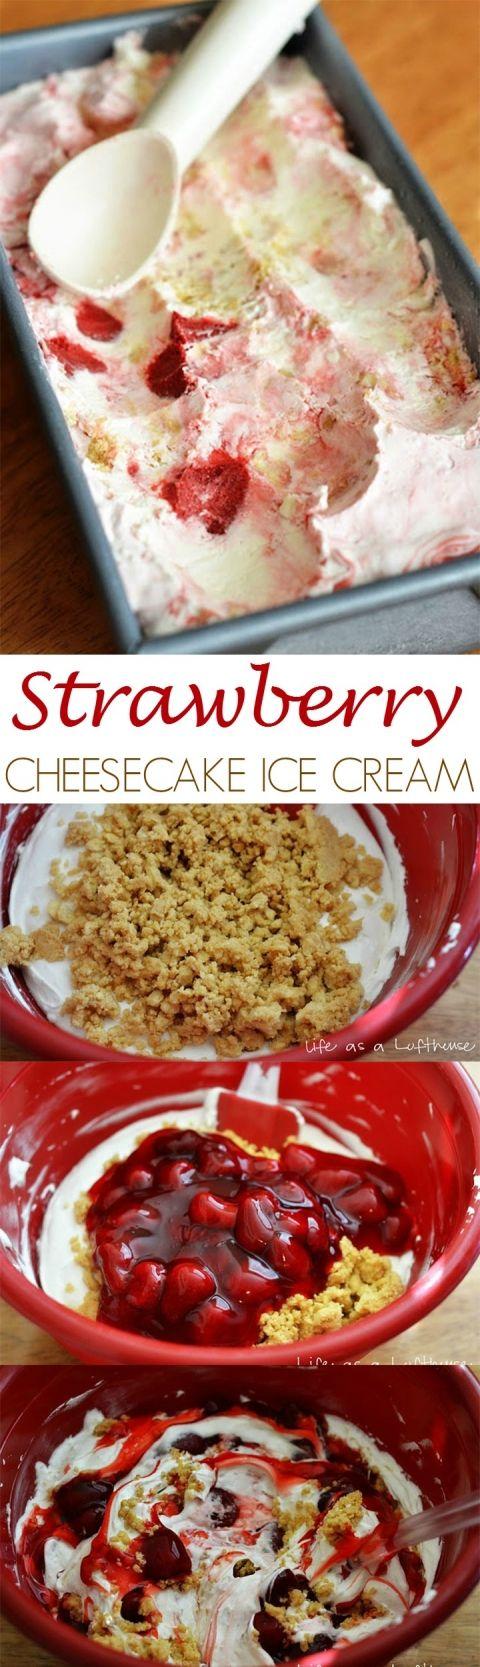 Strawberry_Ice_Cream_PIN #cheesecakeicecream